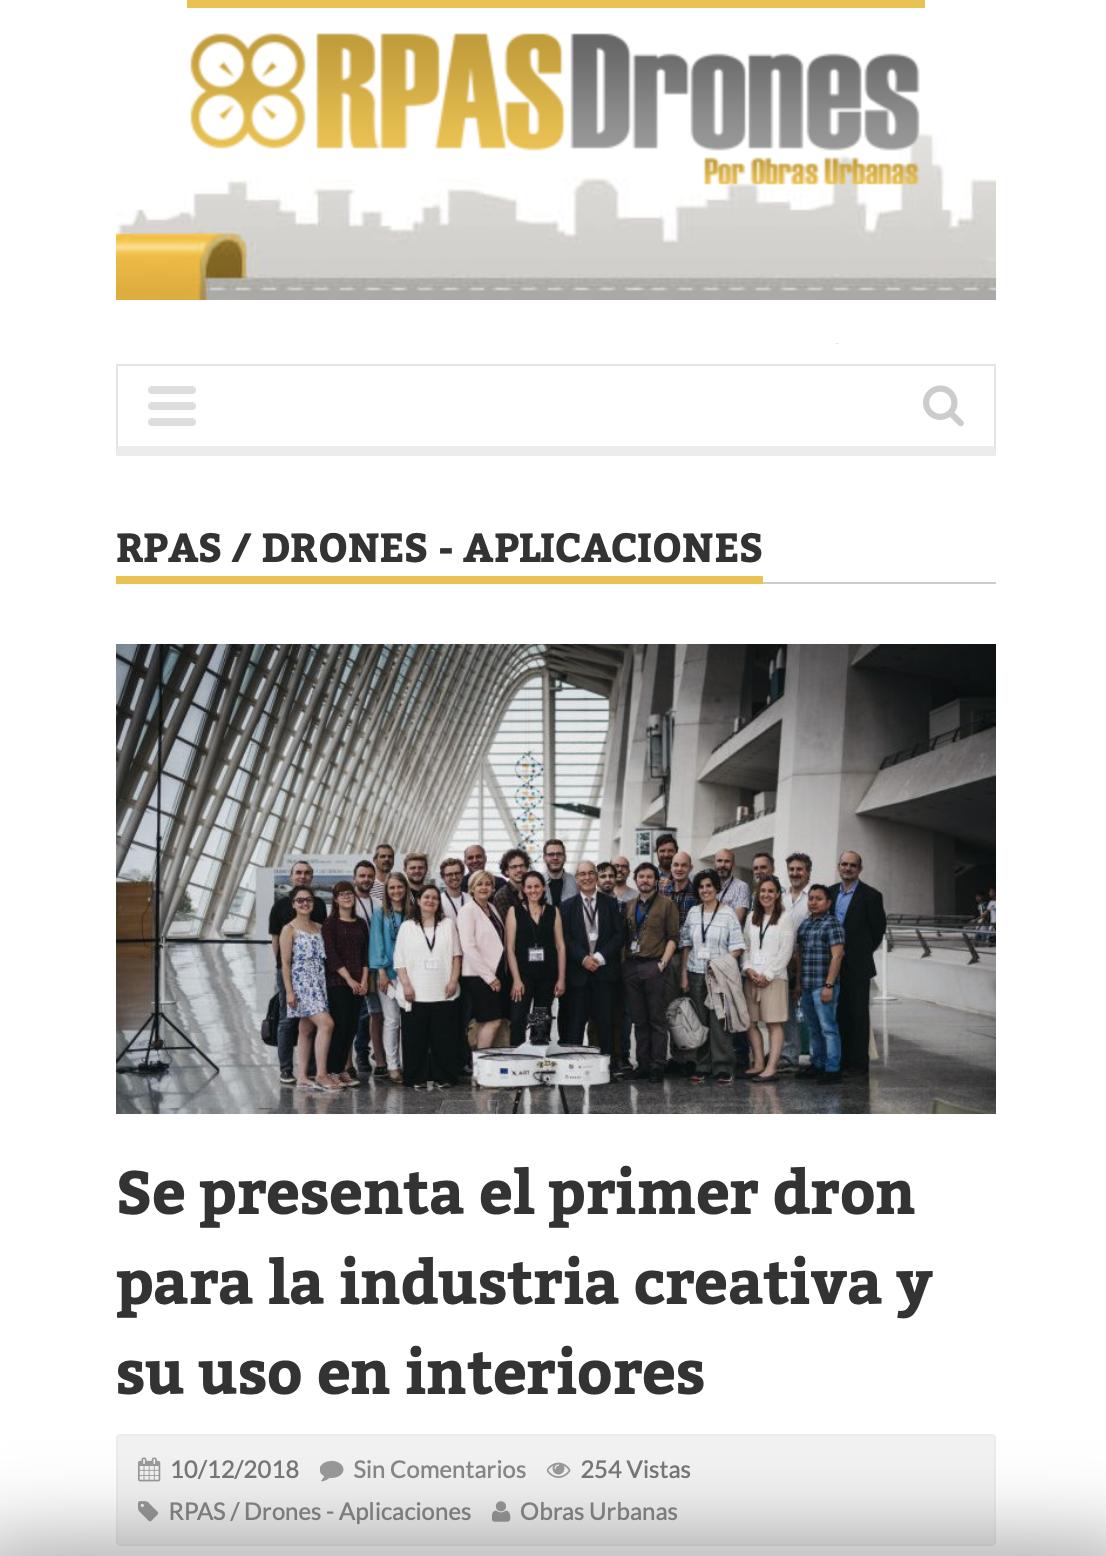 AiRT in ObrasUrbanas.es